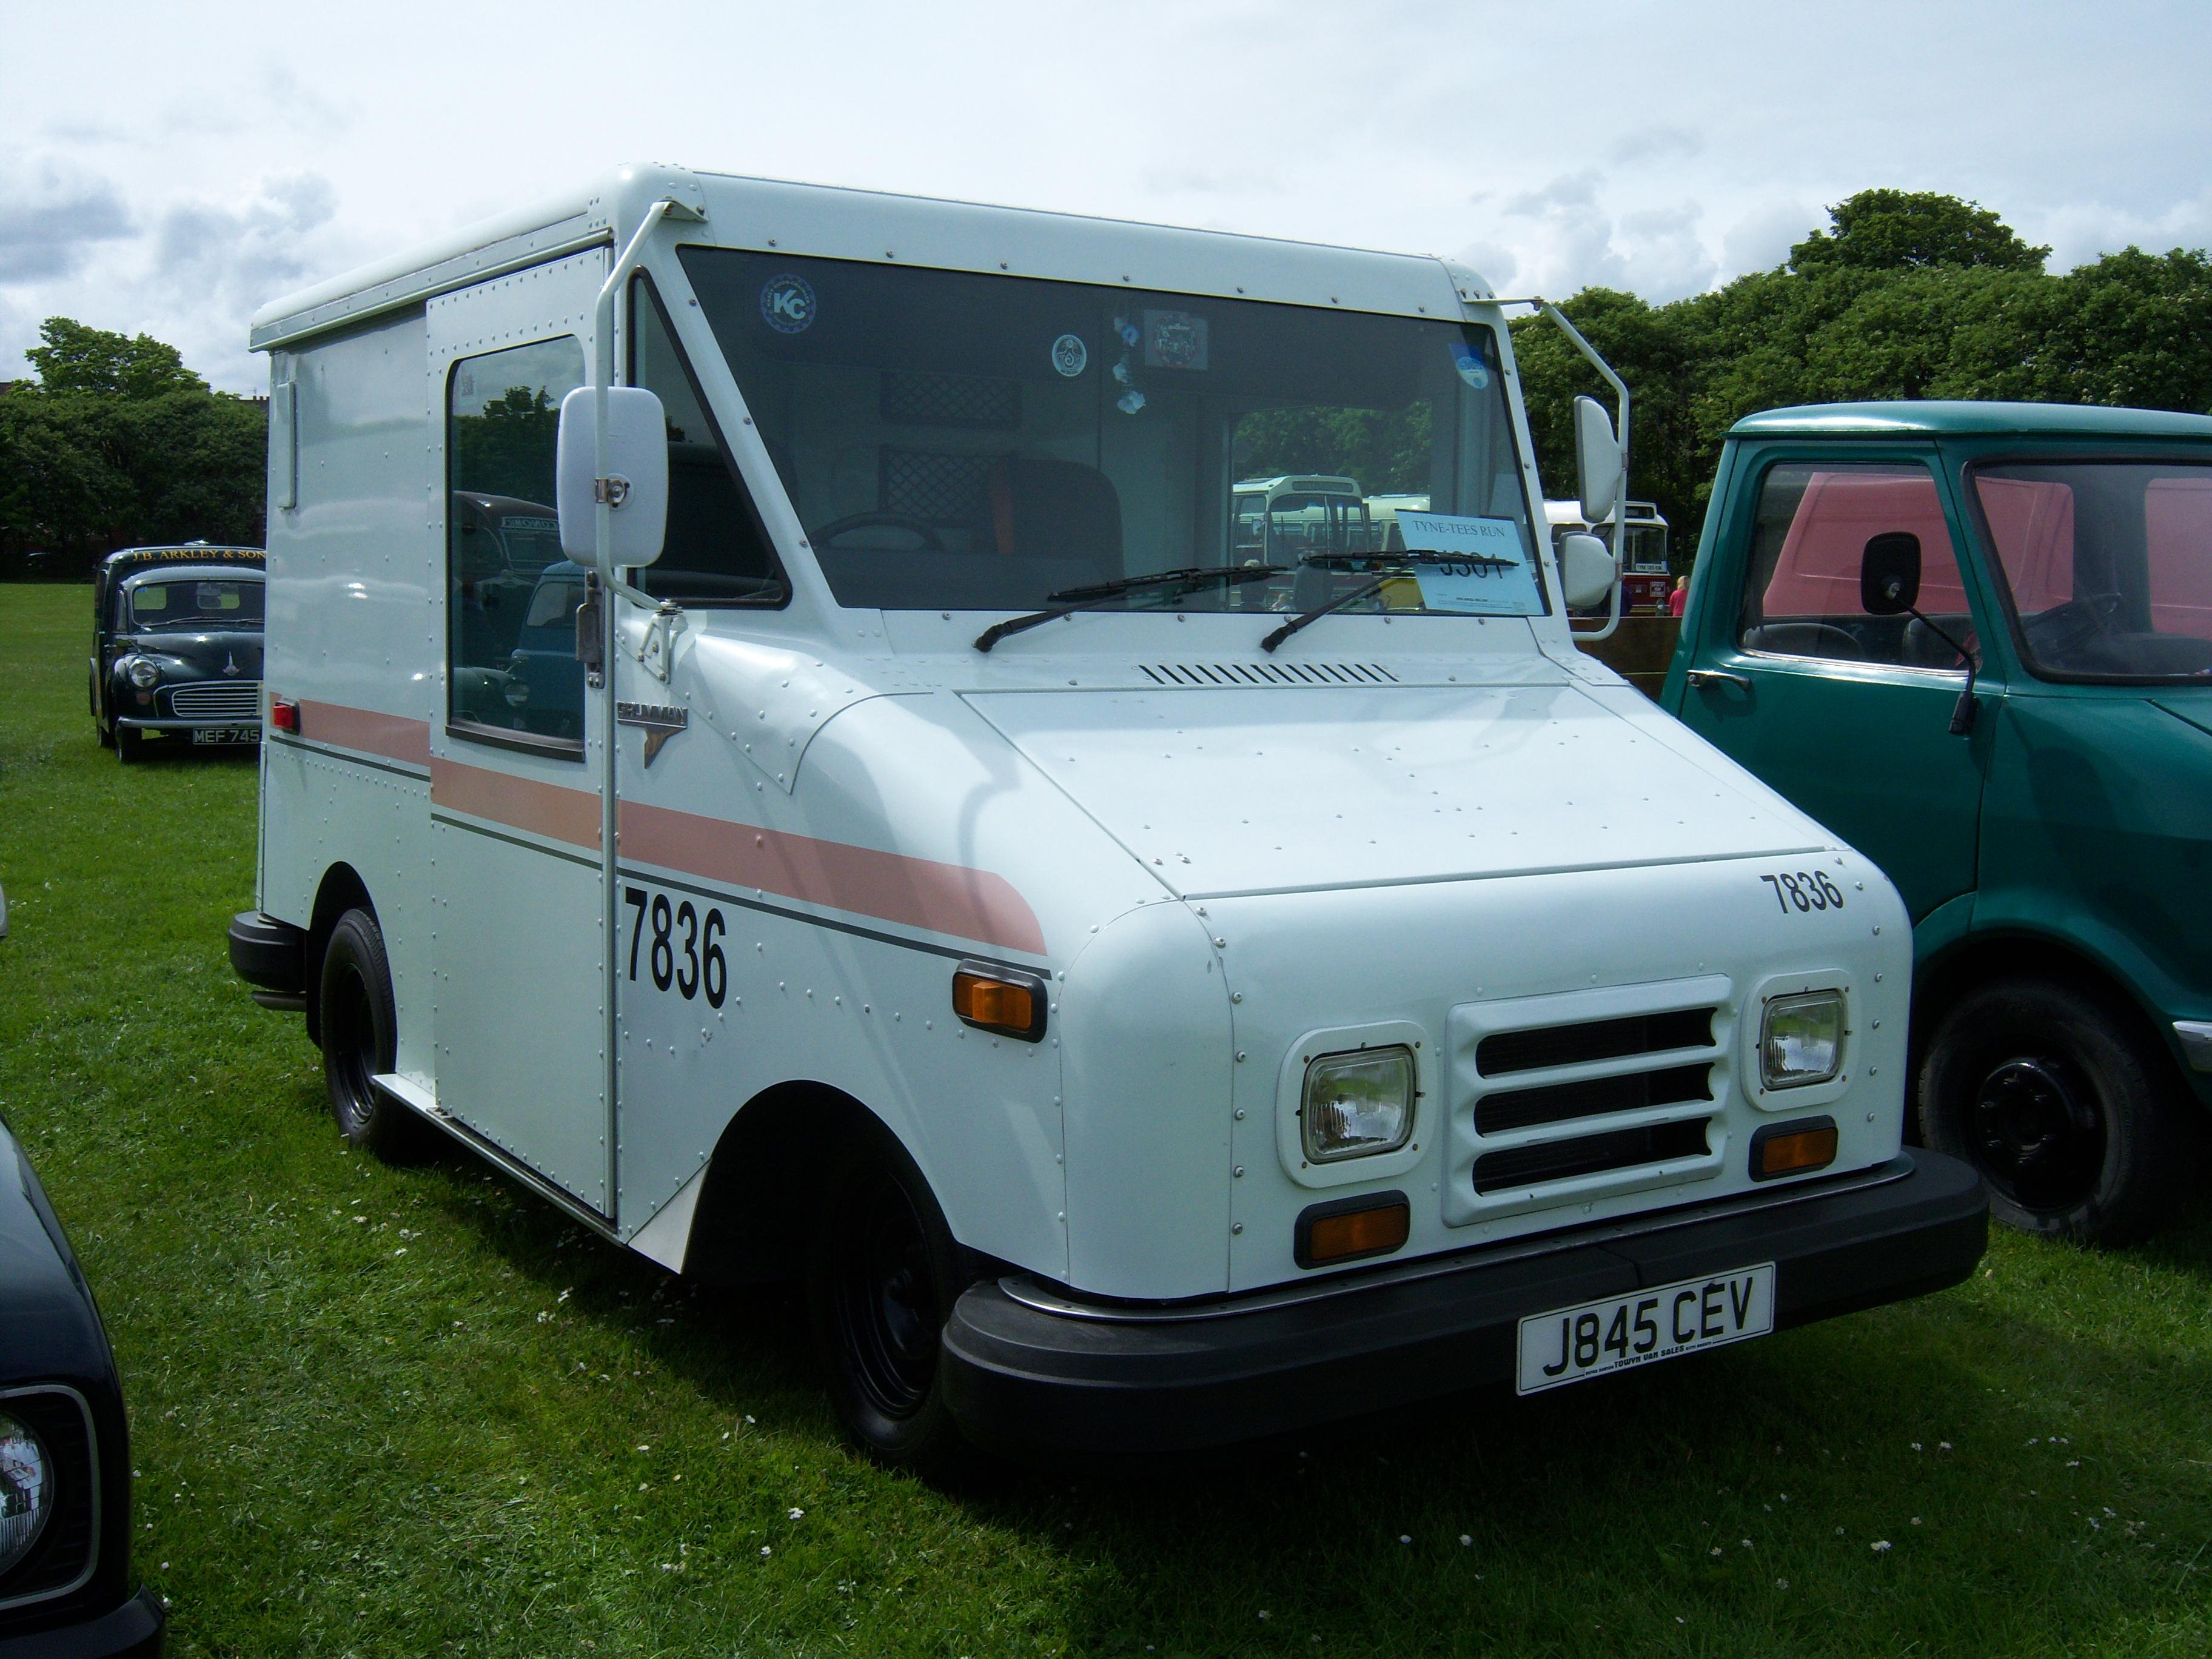 File Grumman Llv J845 Cev Postal Van 2012 Hcvs Tyne